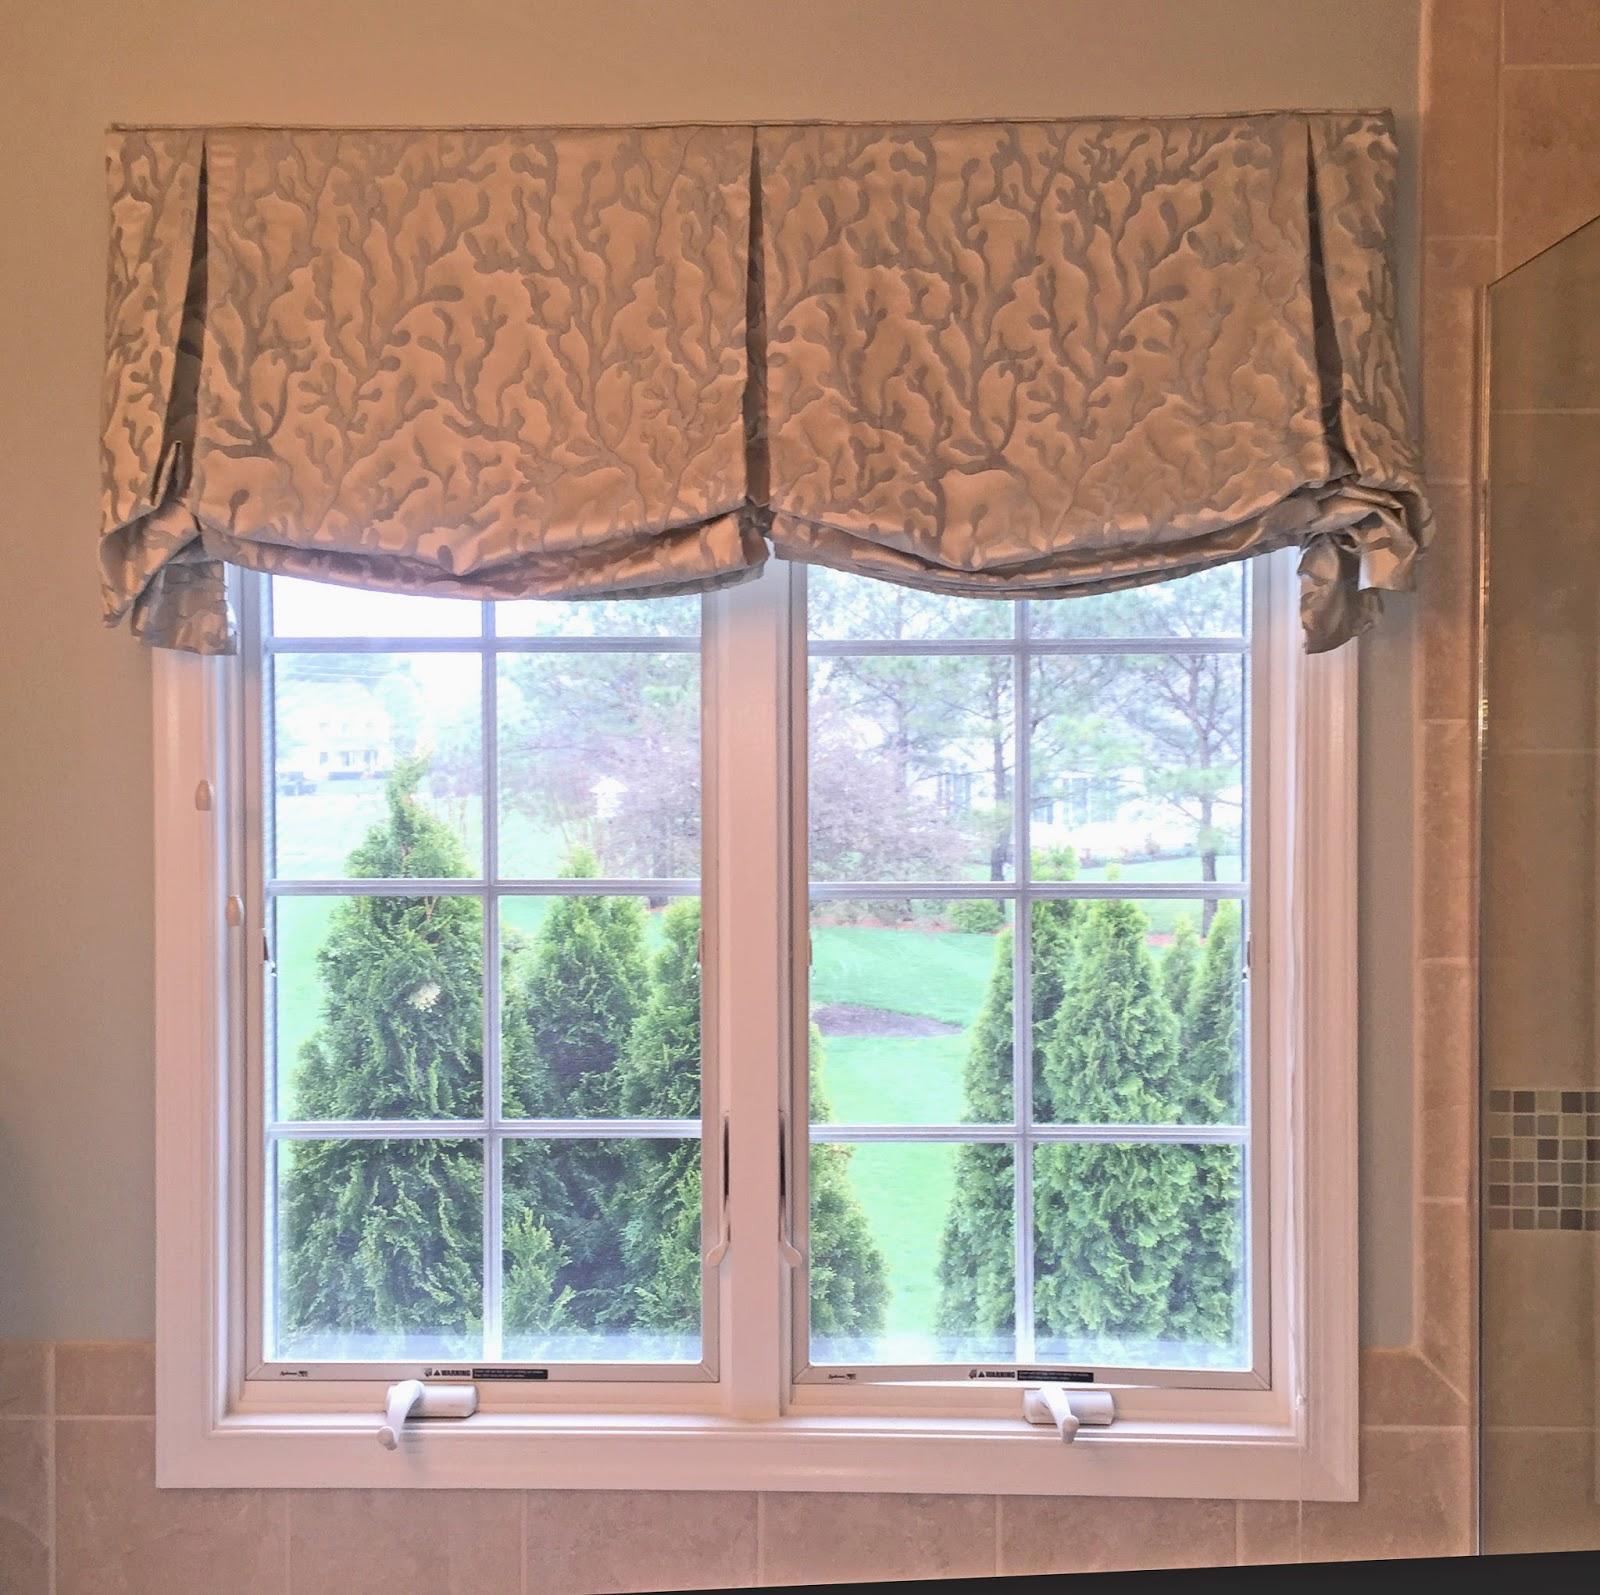 Pam Morris Sews Windows